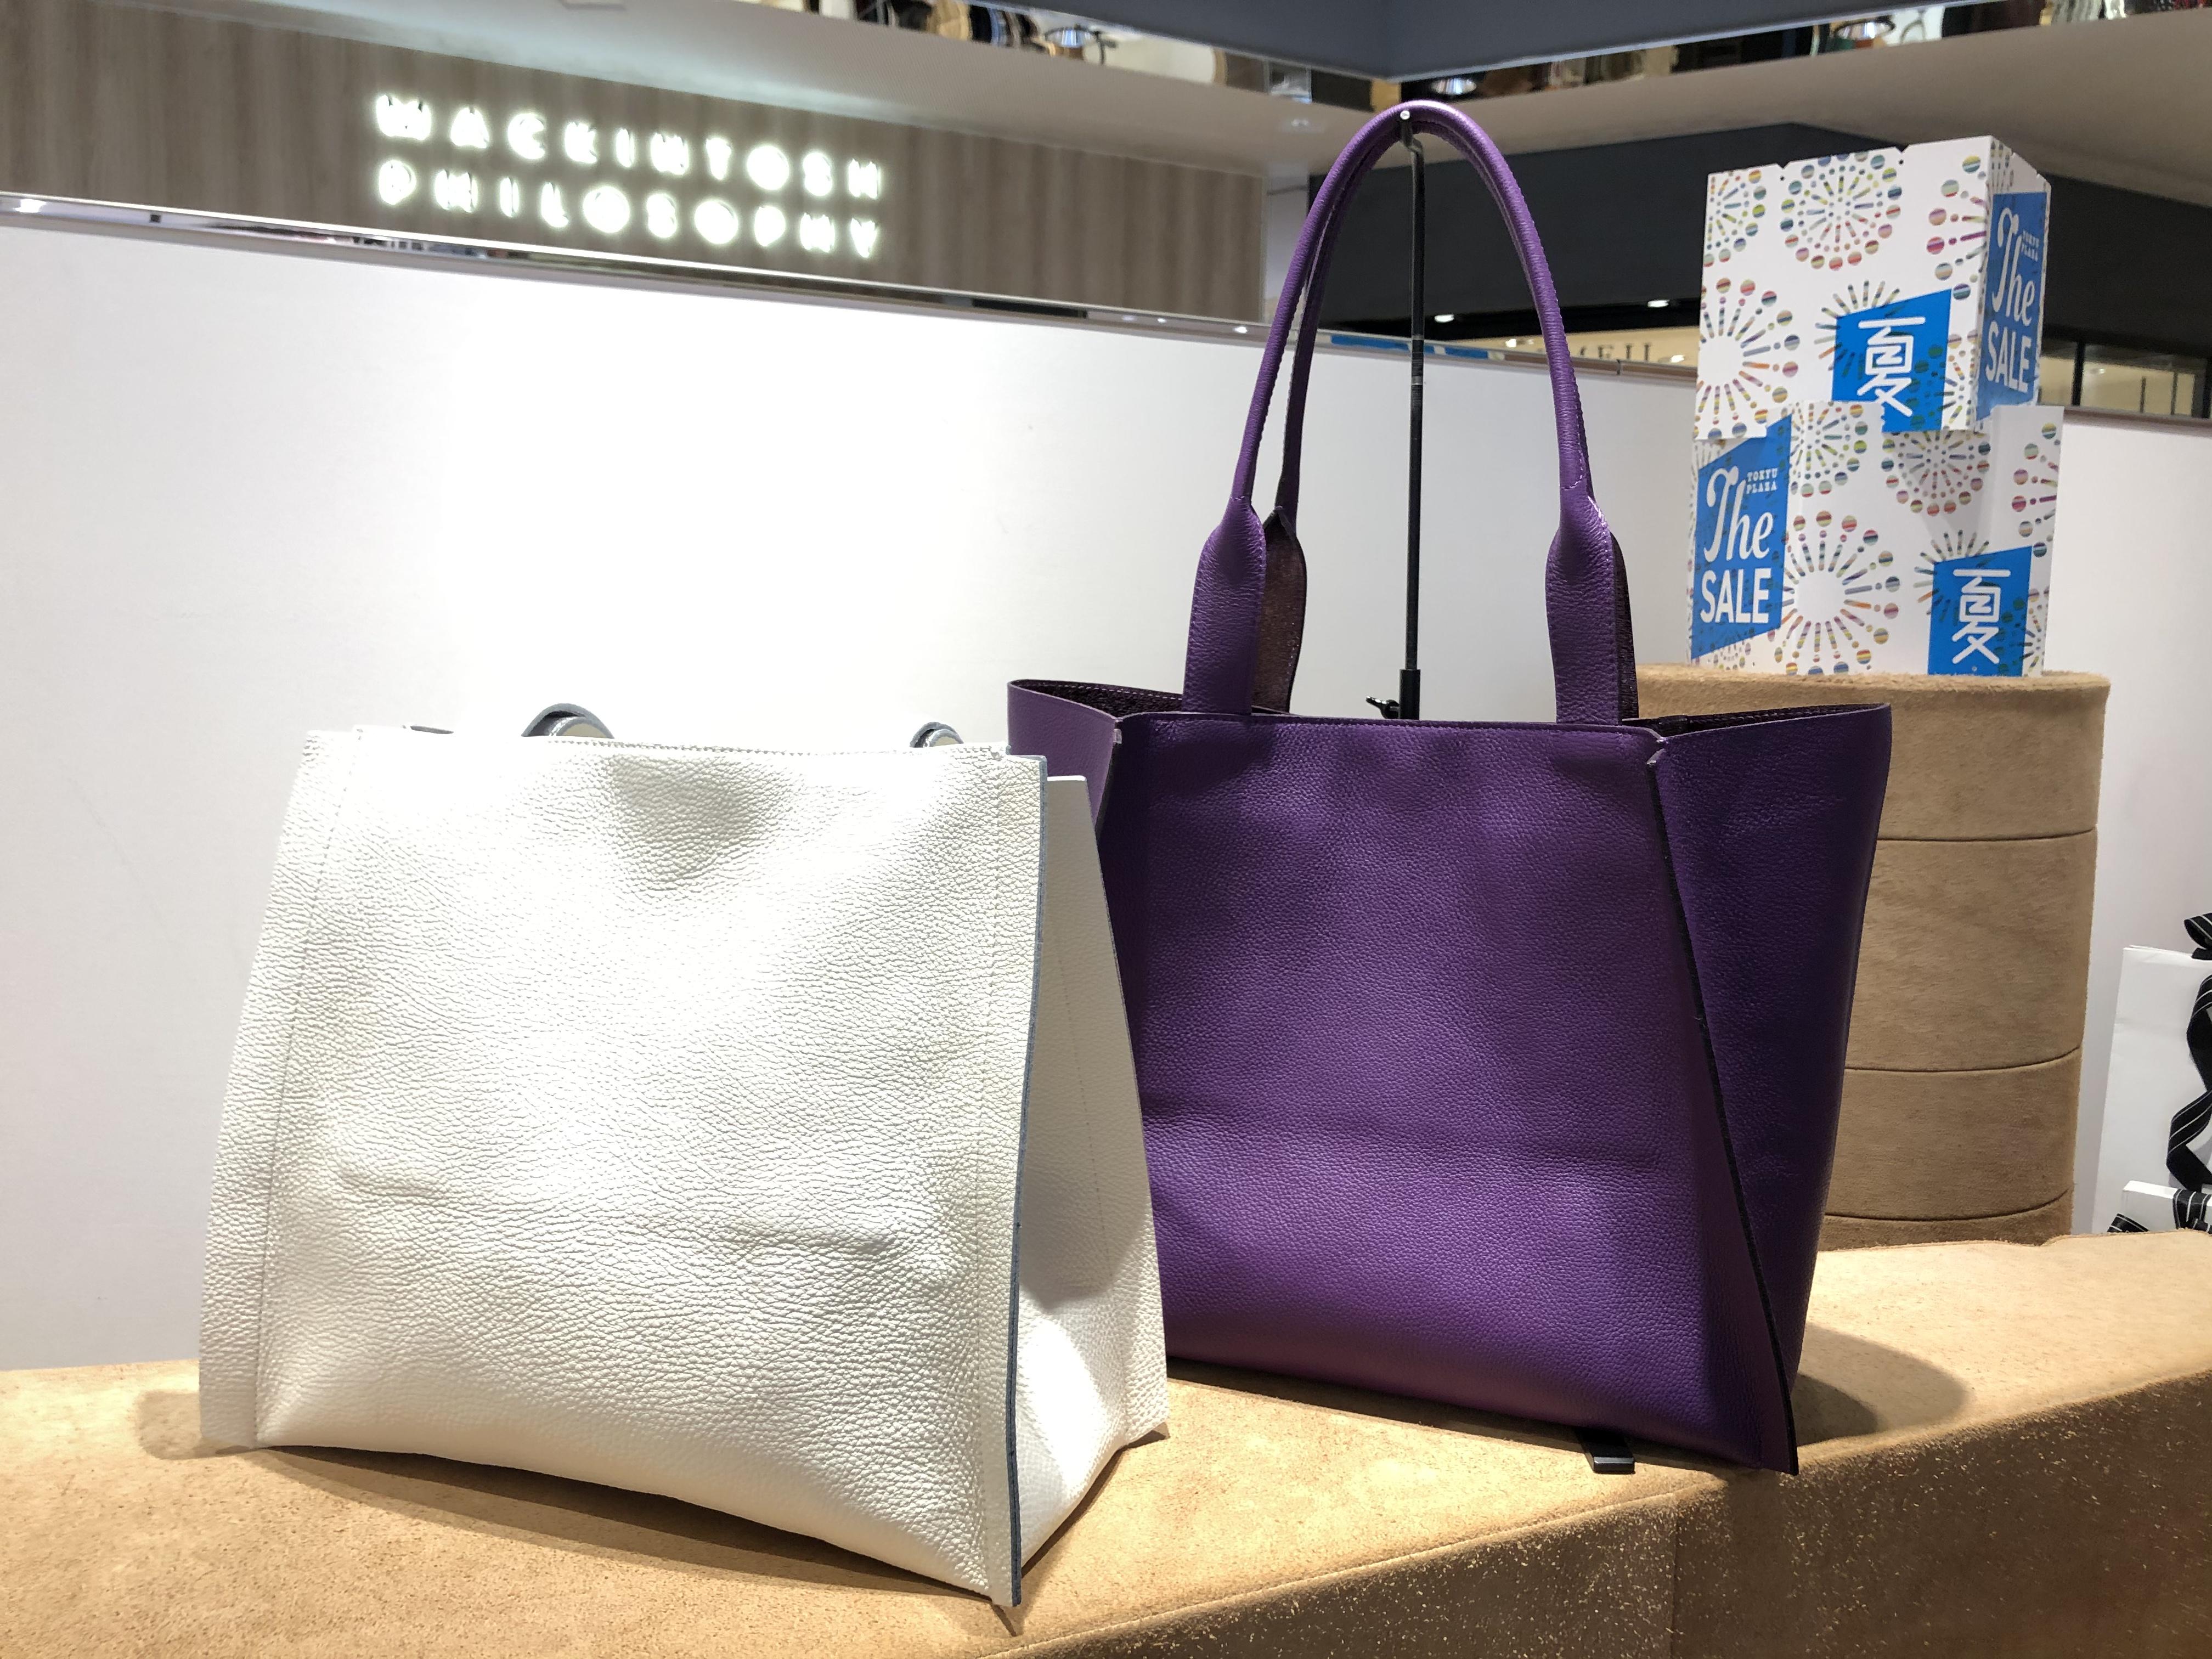 【Epoi block】セール品バッグ徹底解説 ~大容量バッグ編~